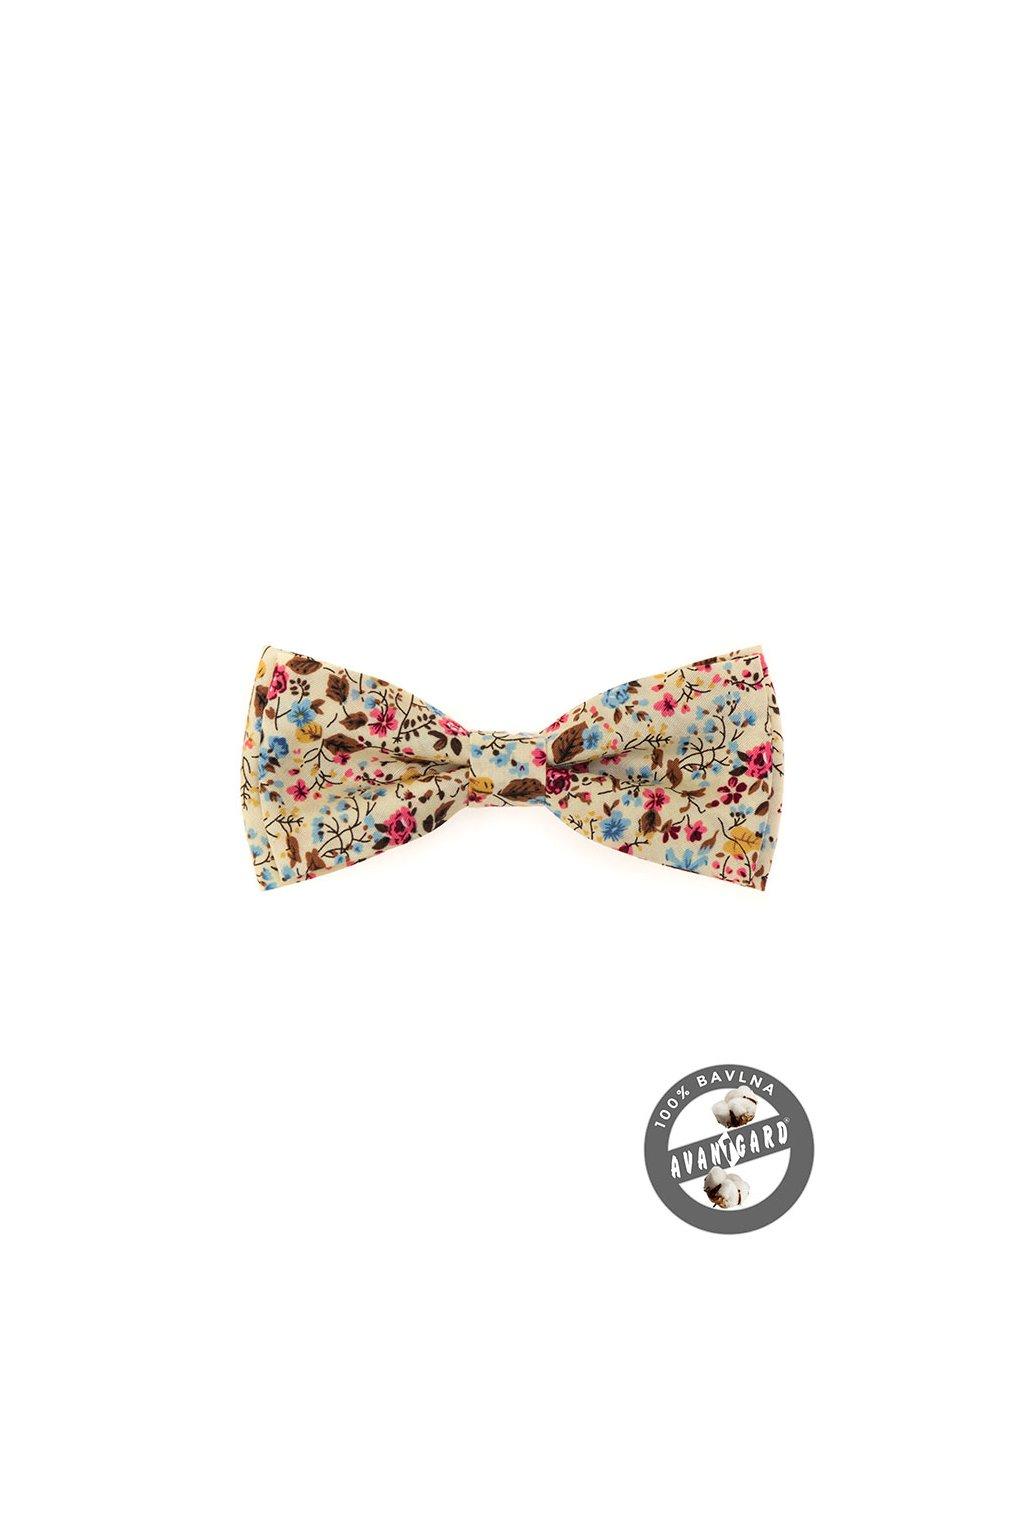 Bavlněný smetanový motýlek – barevný květovaný vzor